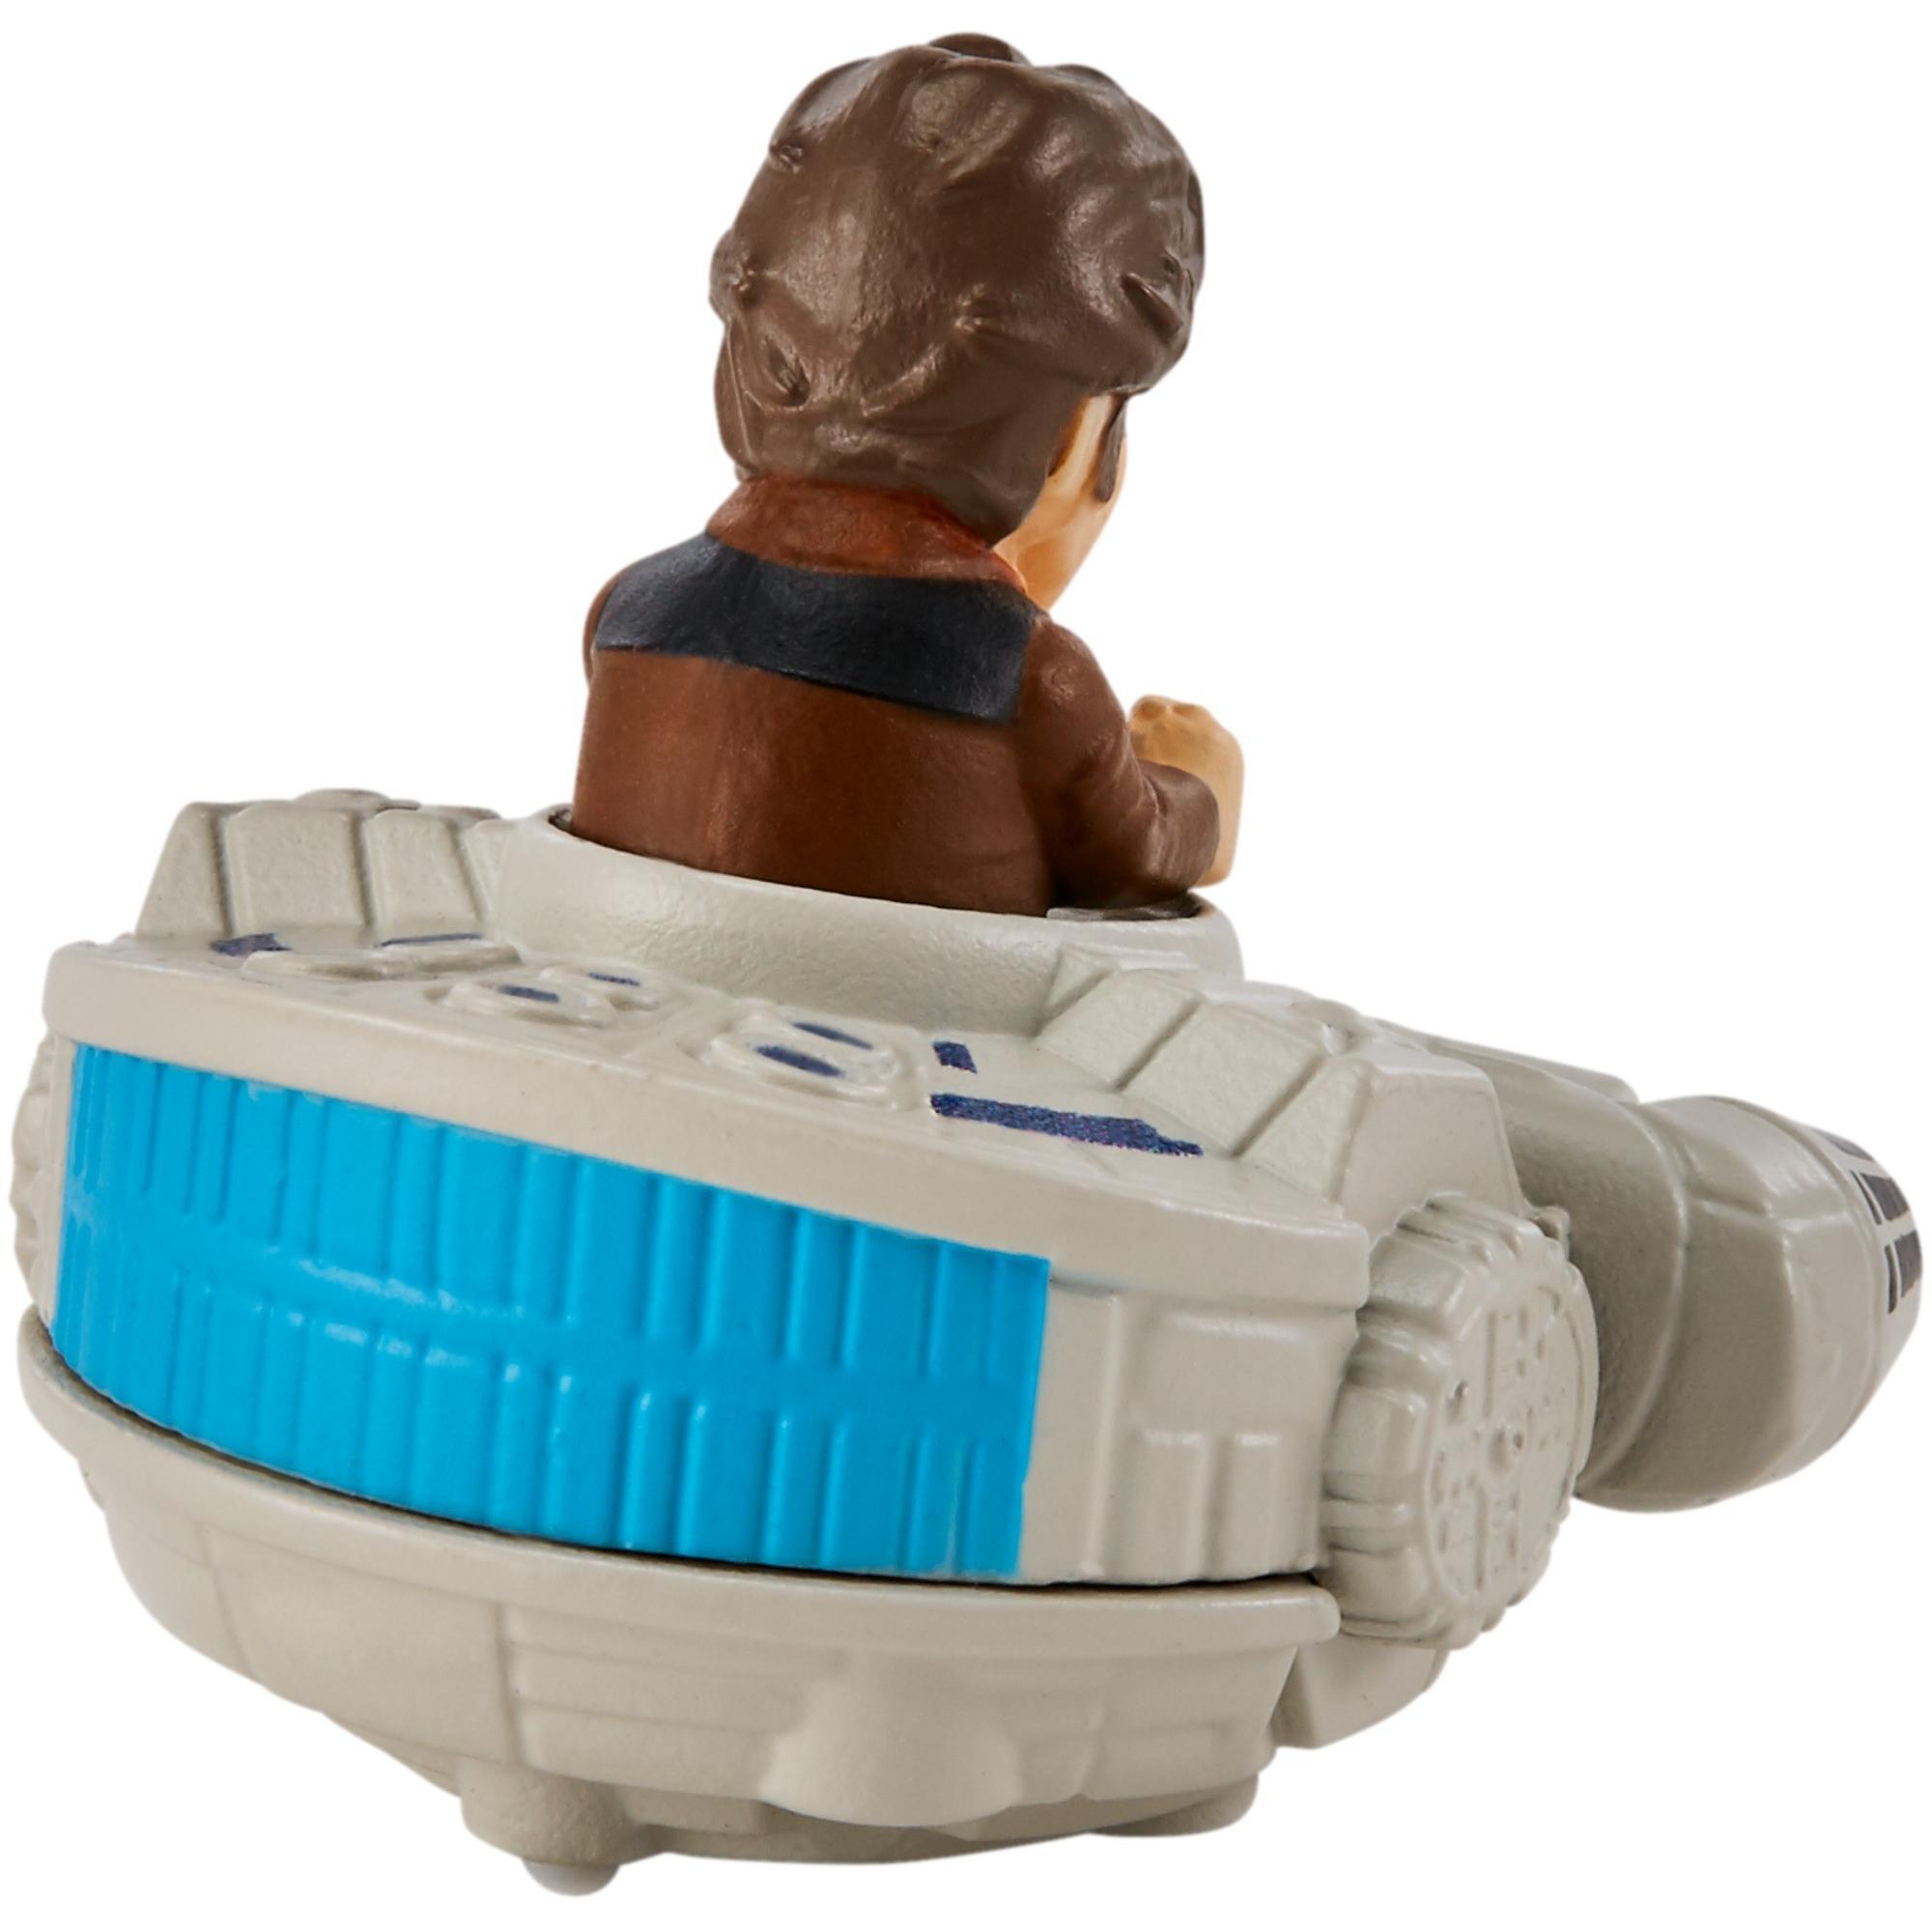 Solo: ASWS Han Solo Millennium Falcon Battle Roller Toy 3